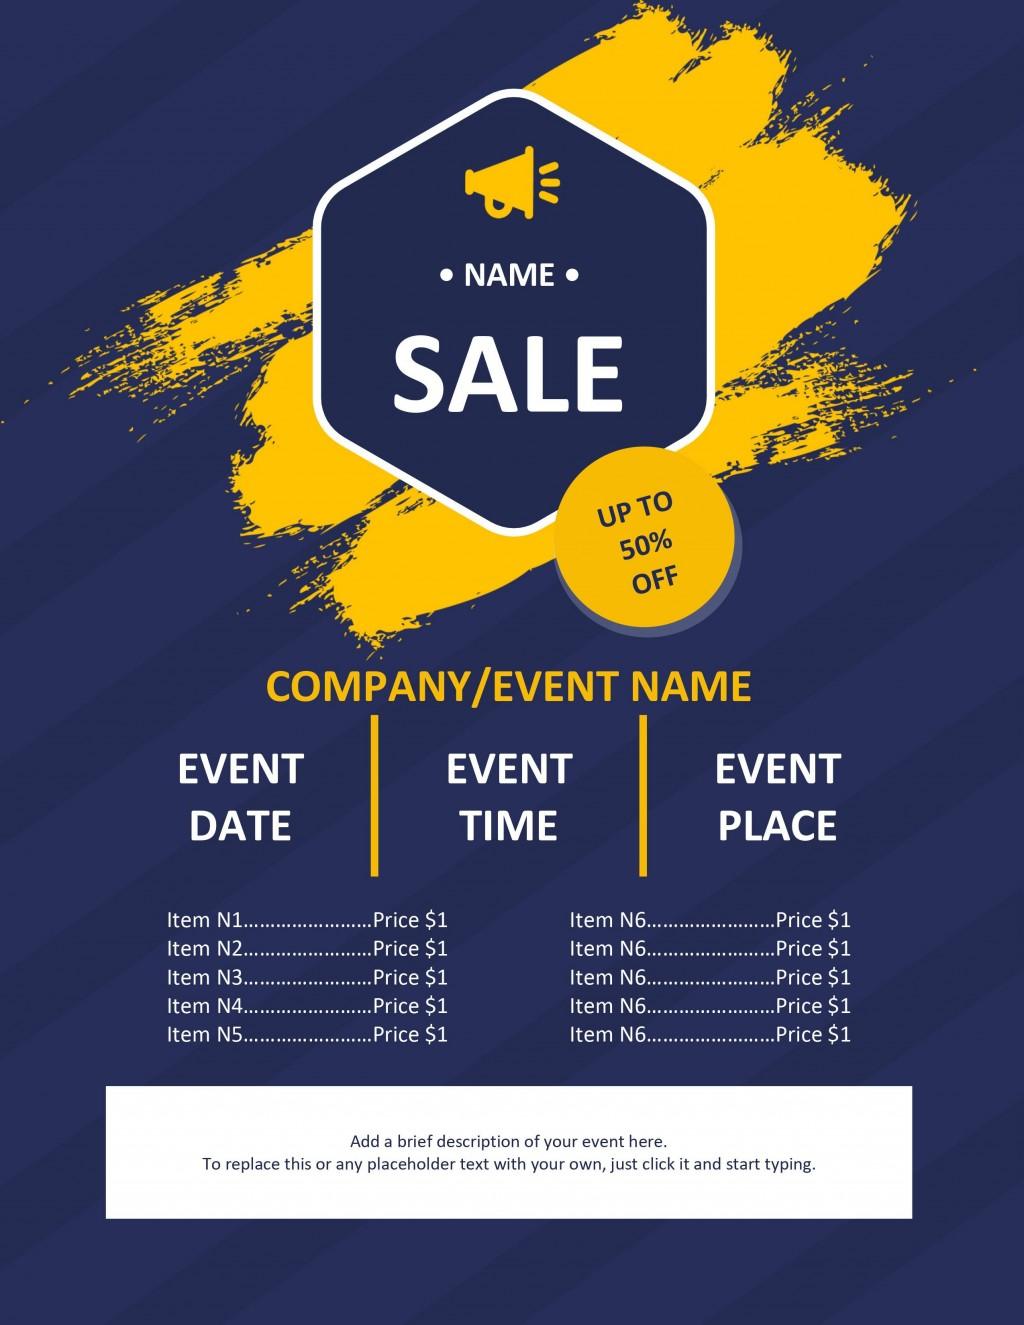 008 Shocking Free Event Flyer Template Word Inspiration  MicrosoftLarge